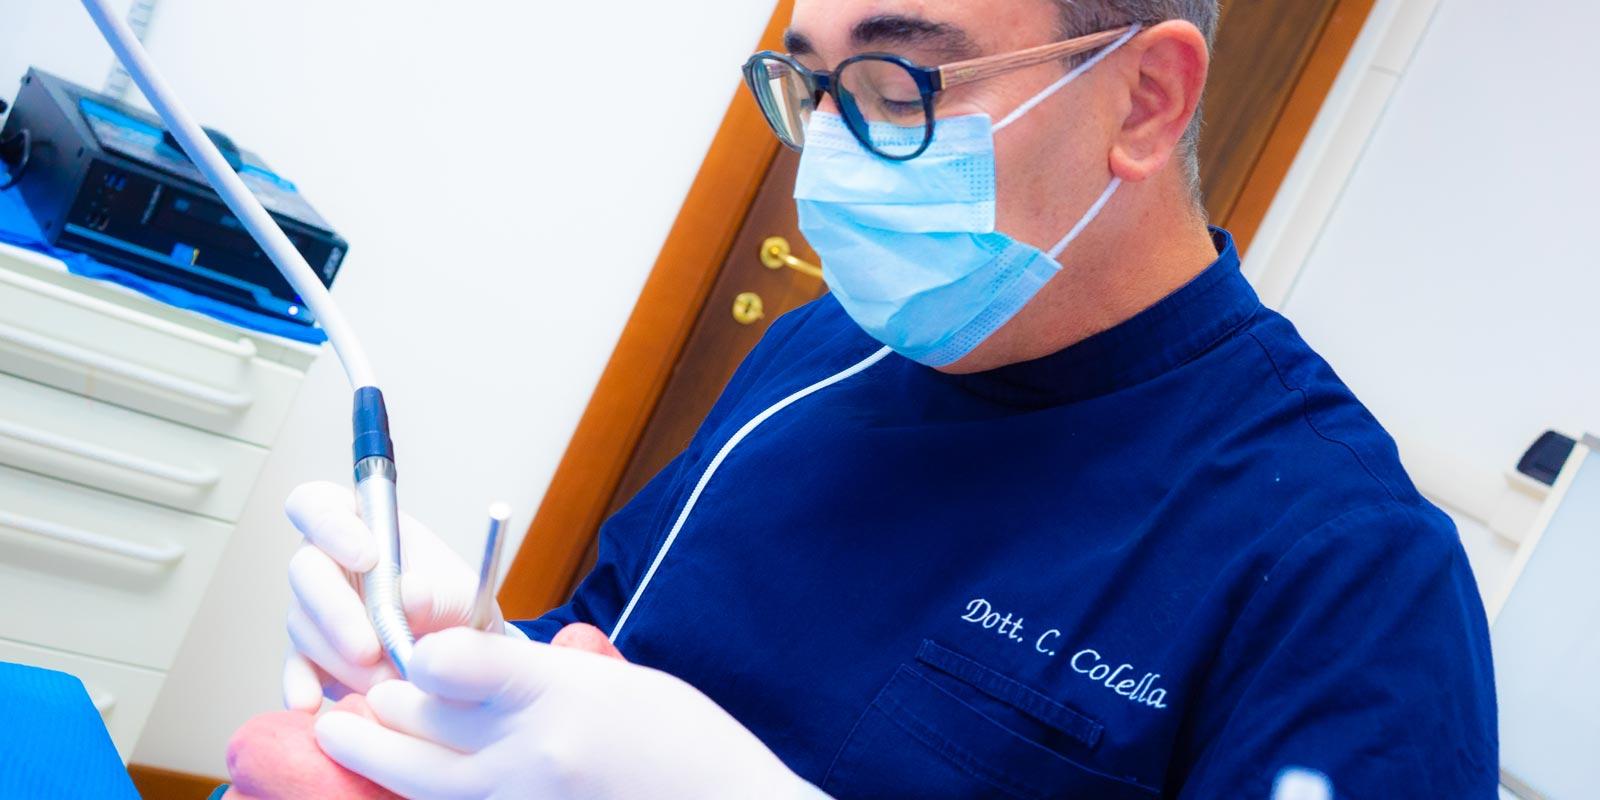 studio-dentistico-dottor-gola-casteggio-odontoiatria-pavia-dentista-implantologia-ortodonzia-protesi-chirurgia-58